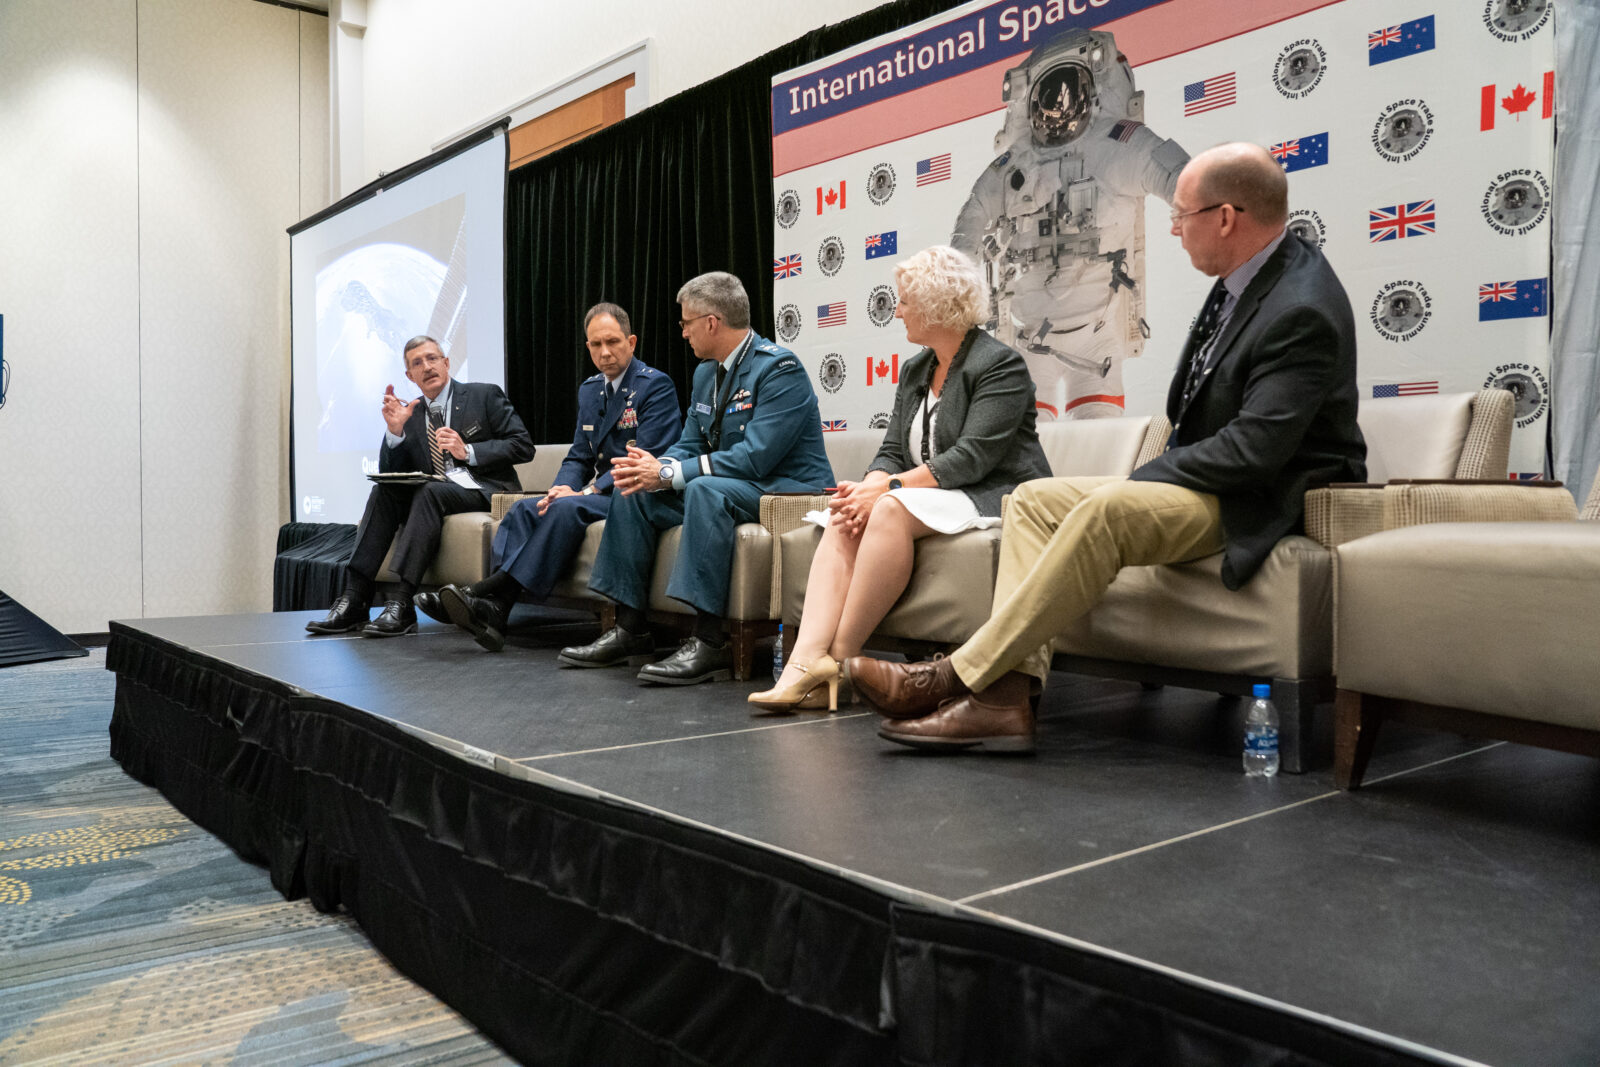 Dan Burbank, Gen. Shaw, K.G. Whale, Alison Petchell, Graham Streatfield